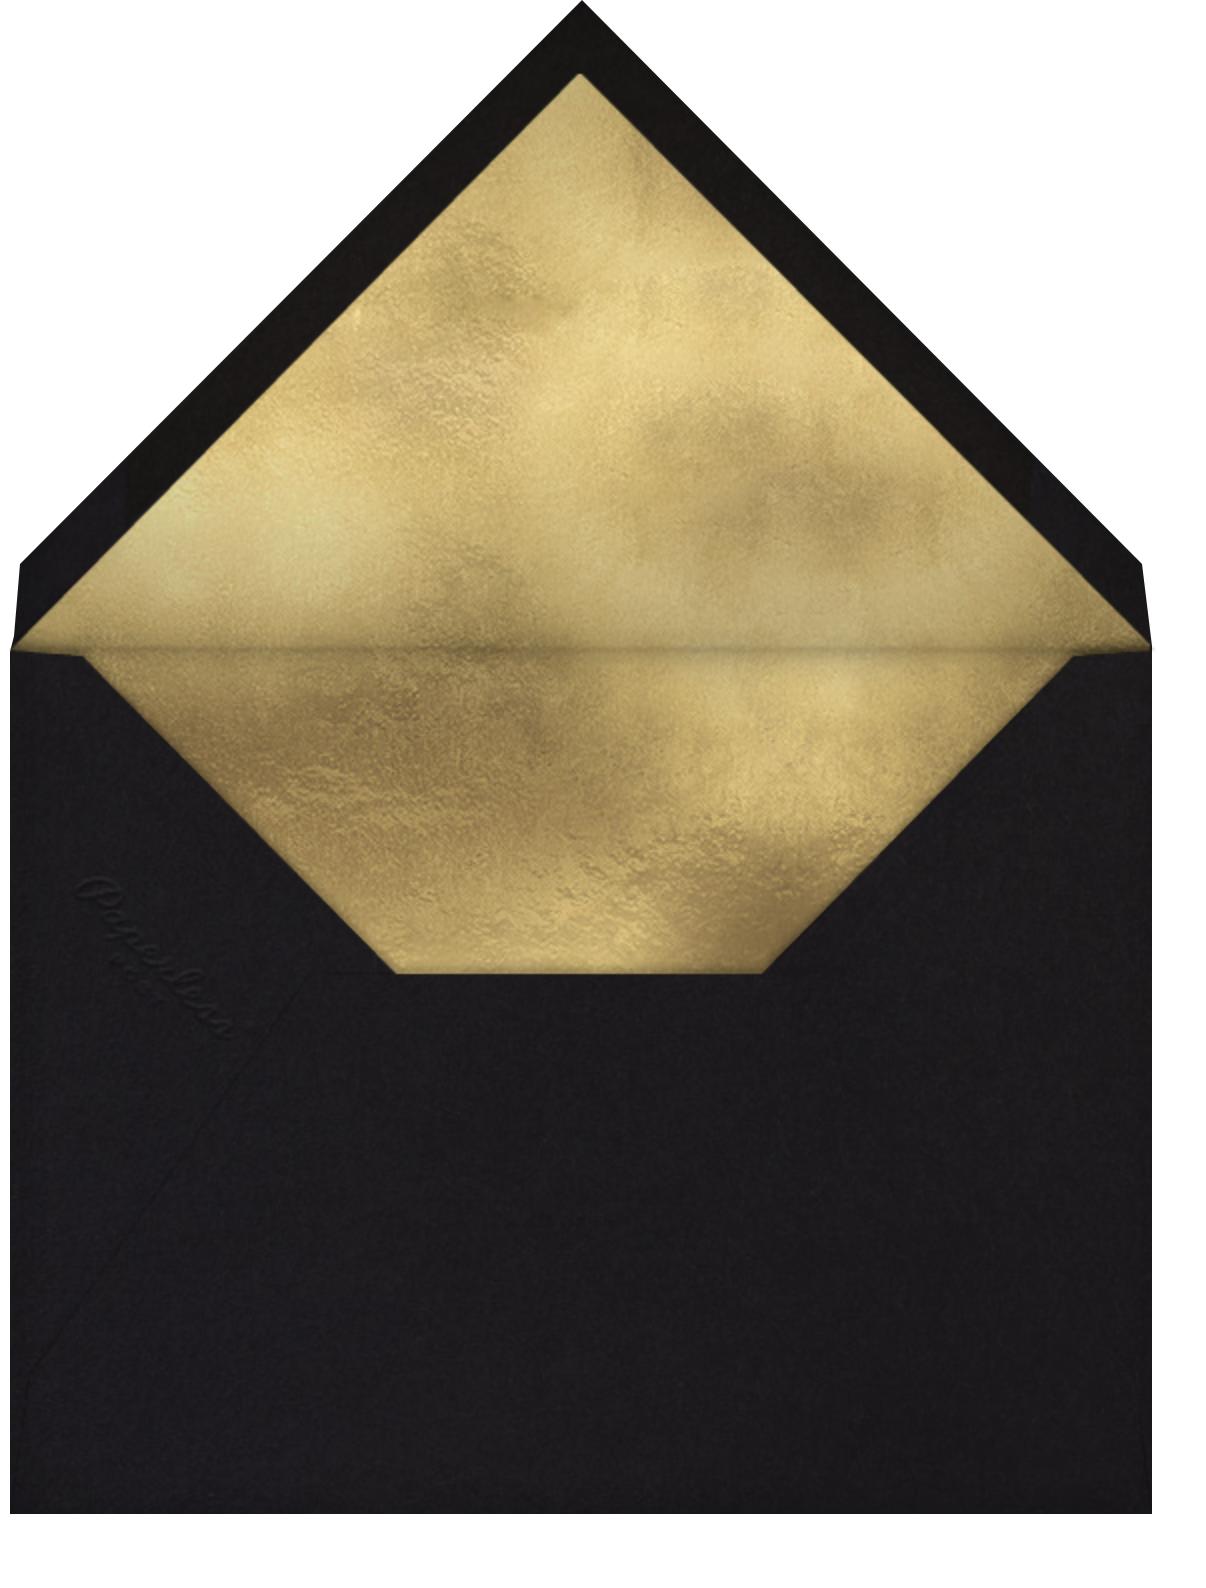 Reel to Reel - Paperless Post - Viewing party - envelope back